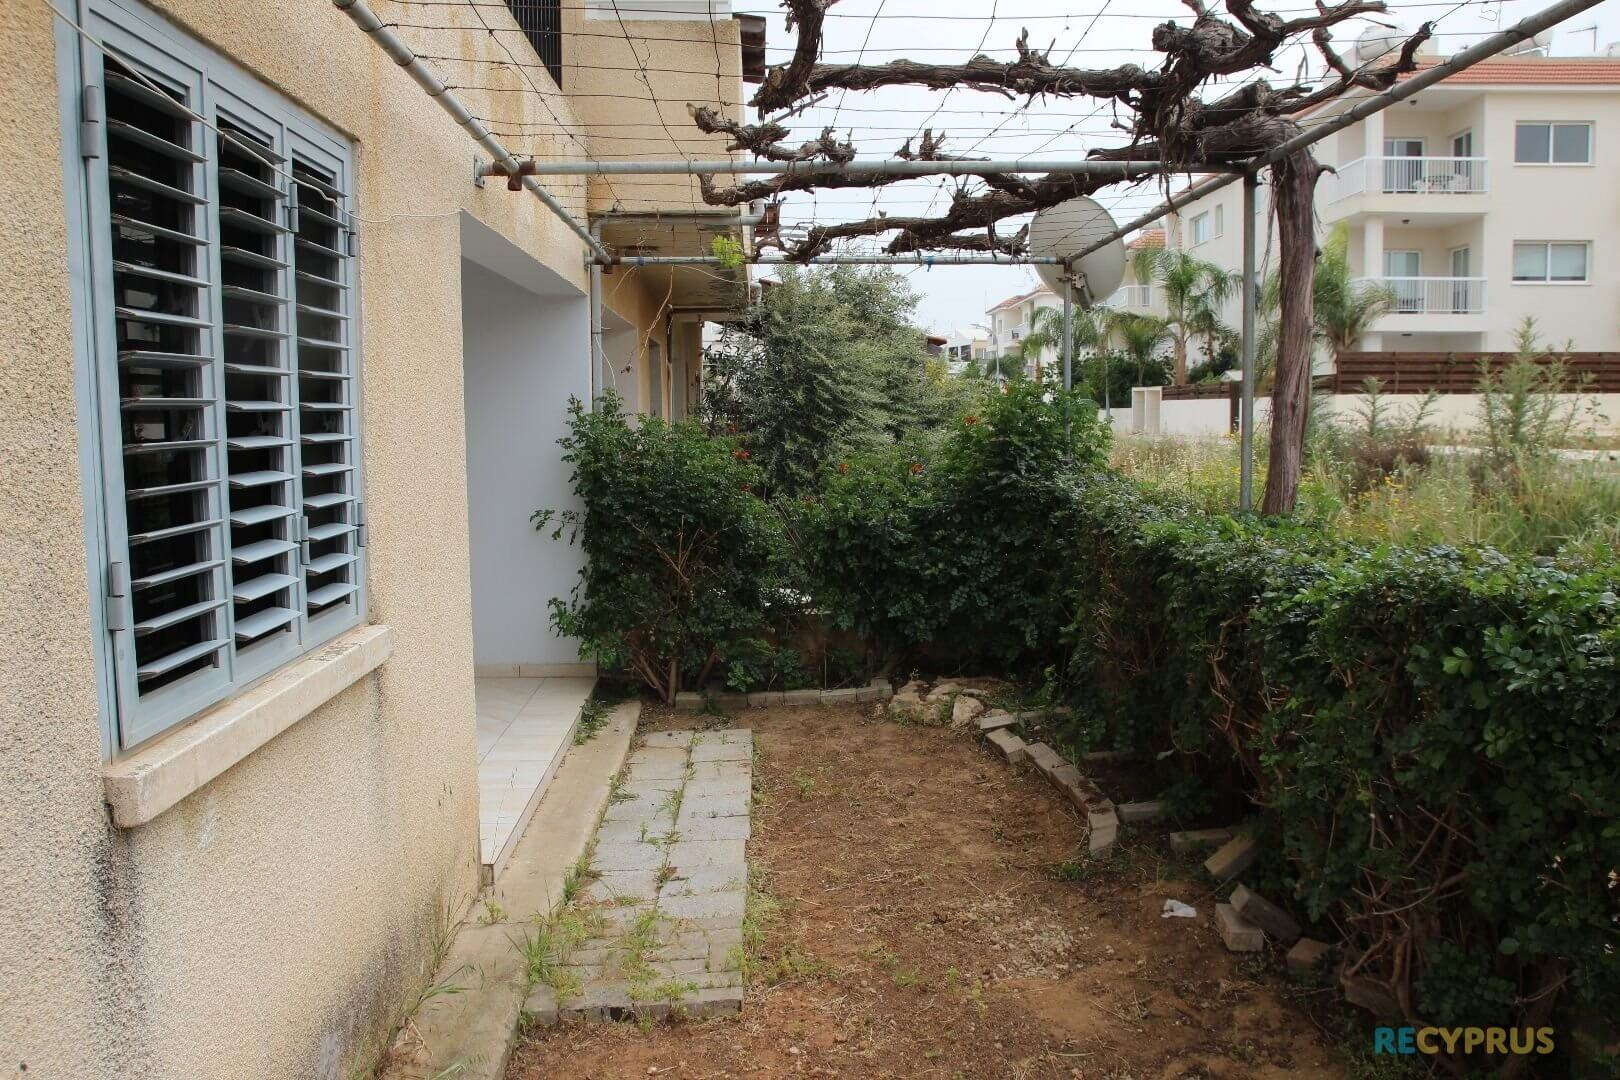 Apartment for sale Kapparis Famagusta Cyprus 7 3559